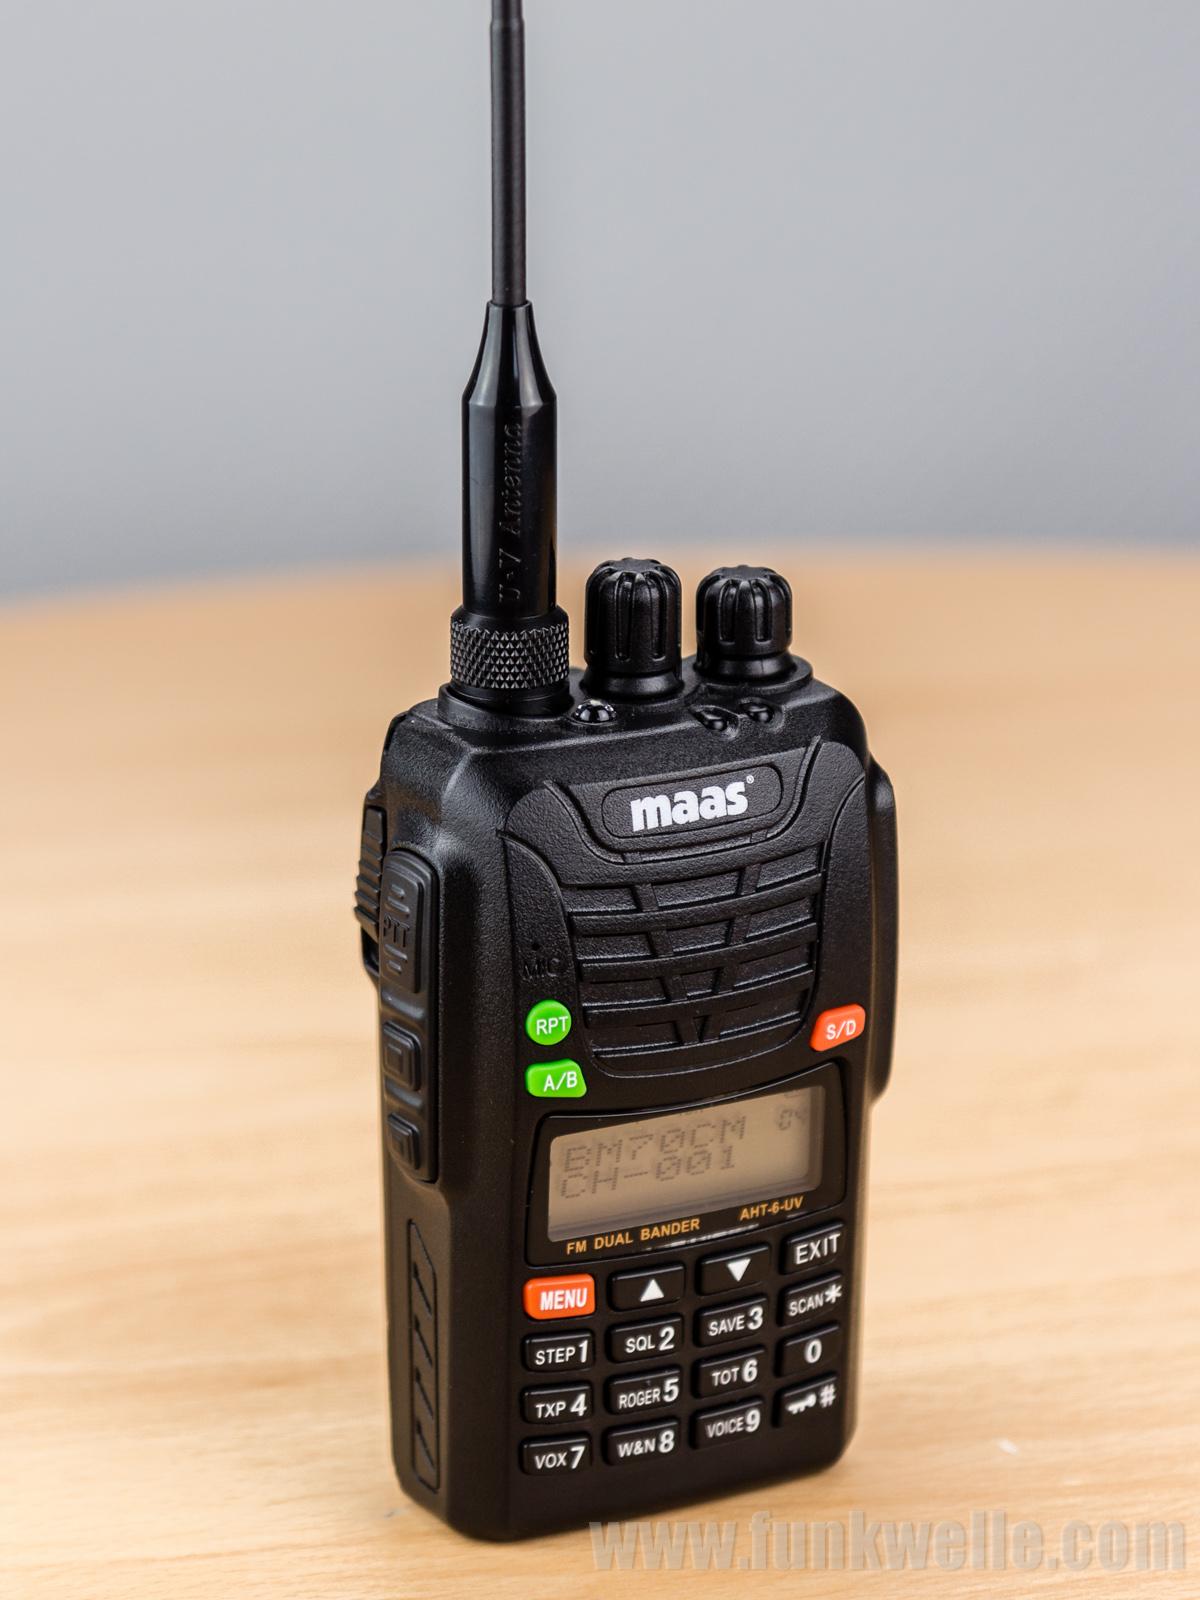 Maas AHT-6-UV / Wouxun KG-UV6D Handfunkgerät